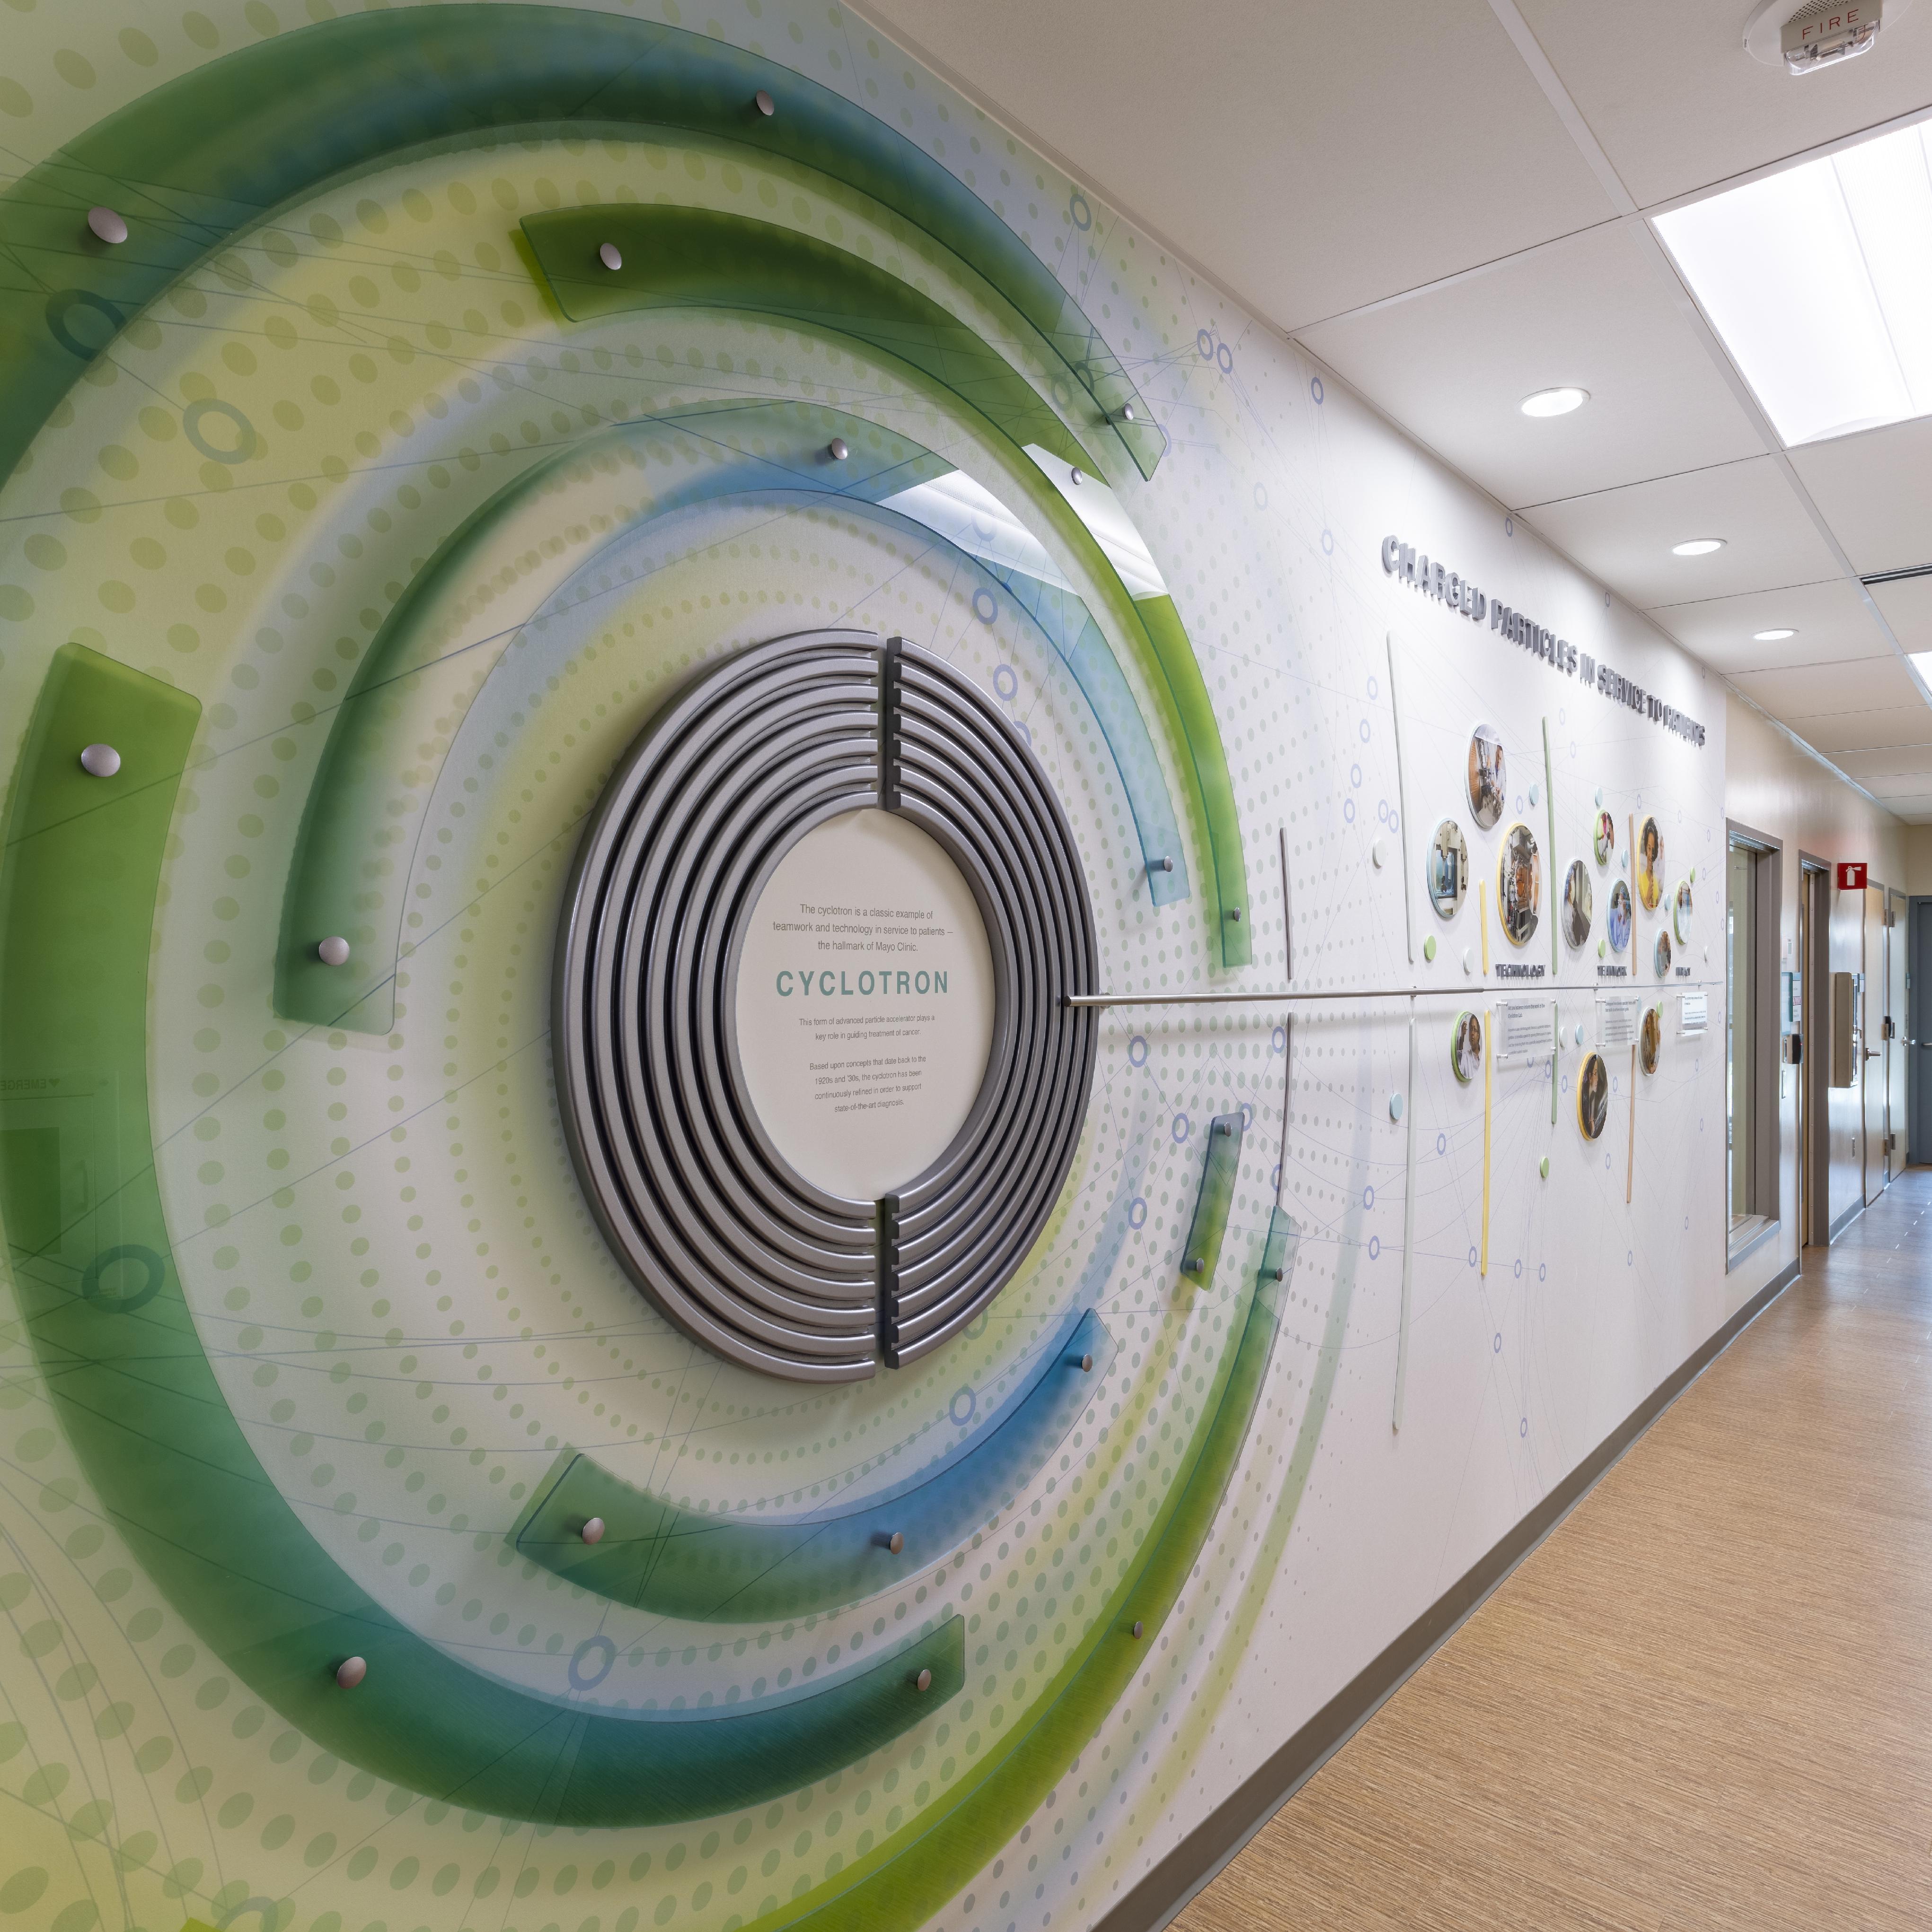 cyclotron display on Mayo Clinic's Arizona campus